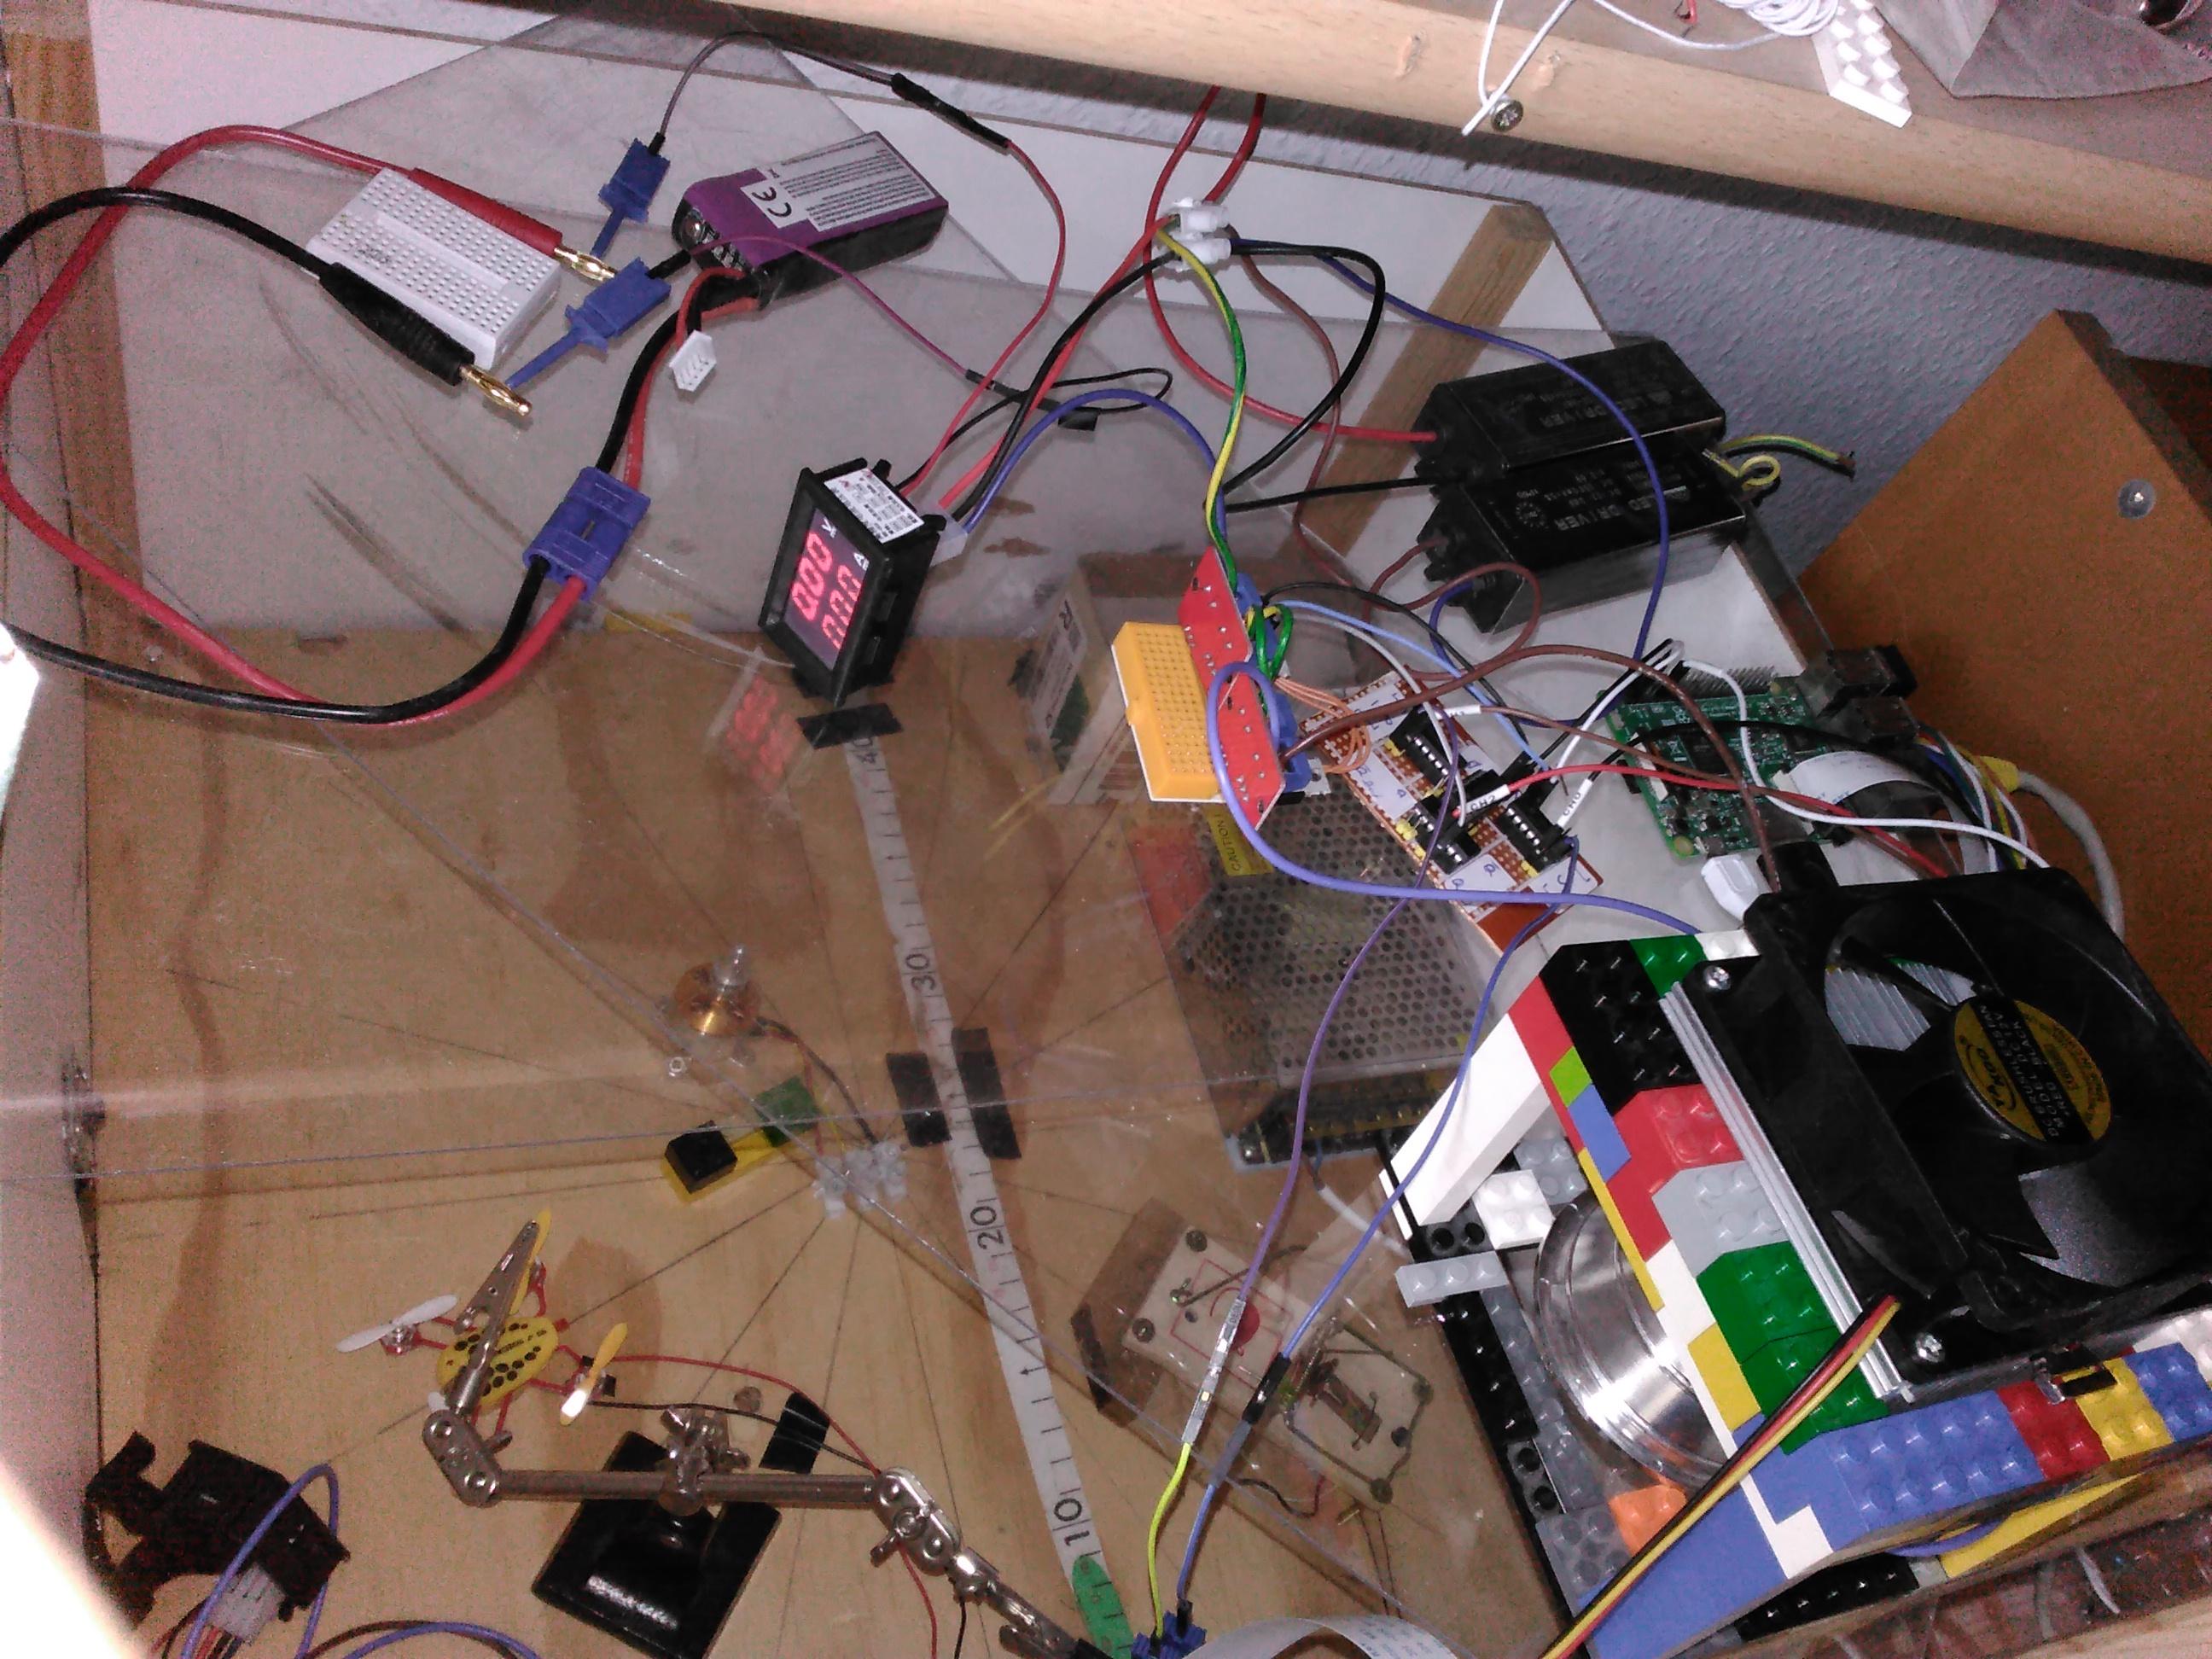 ArduCam OV5647 Camera Board w/ M12 Mount - Page 2 - Raspberry Pi Forums